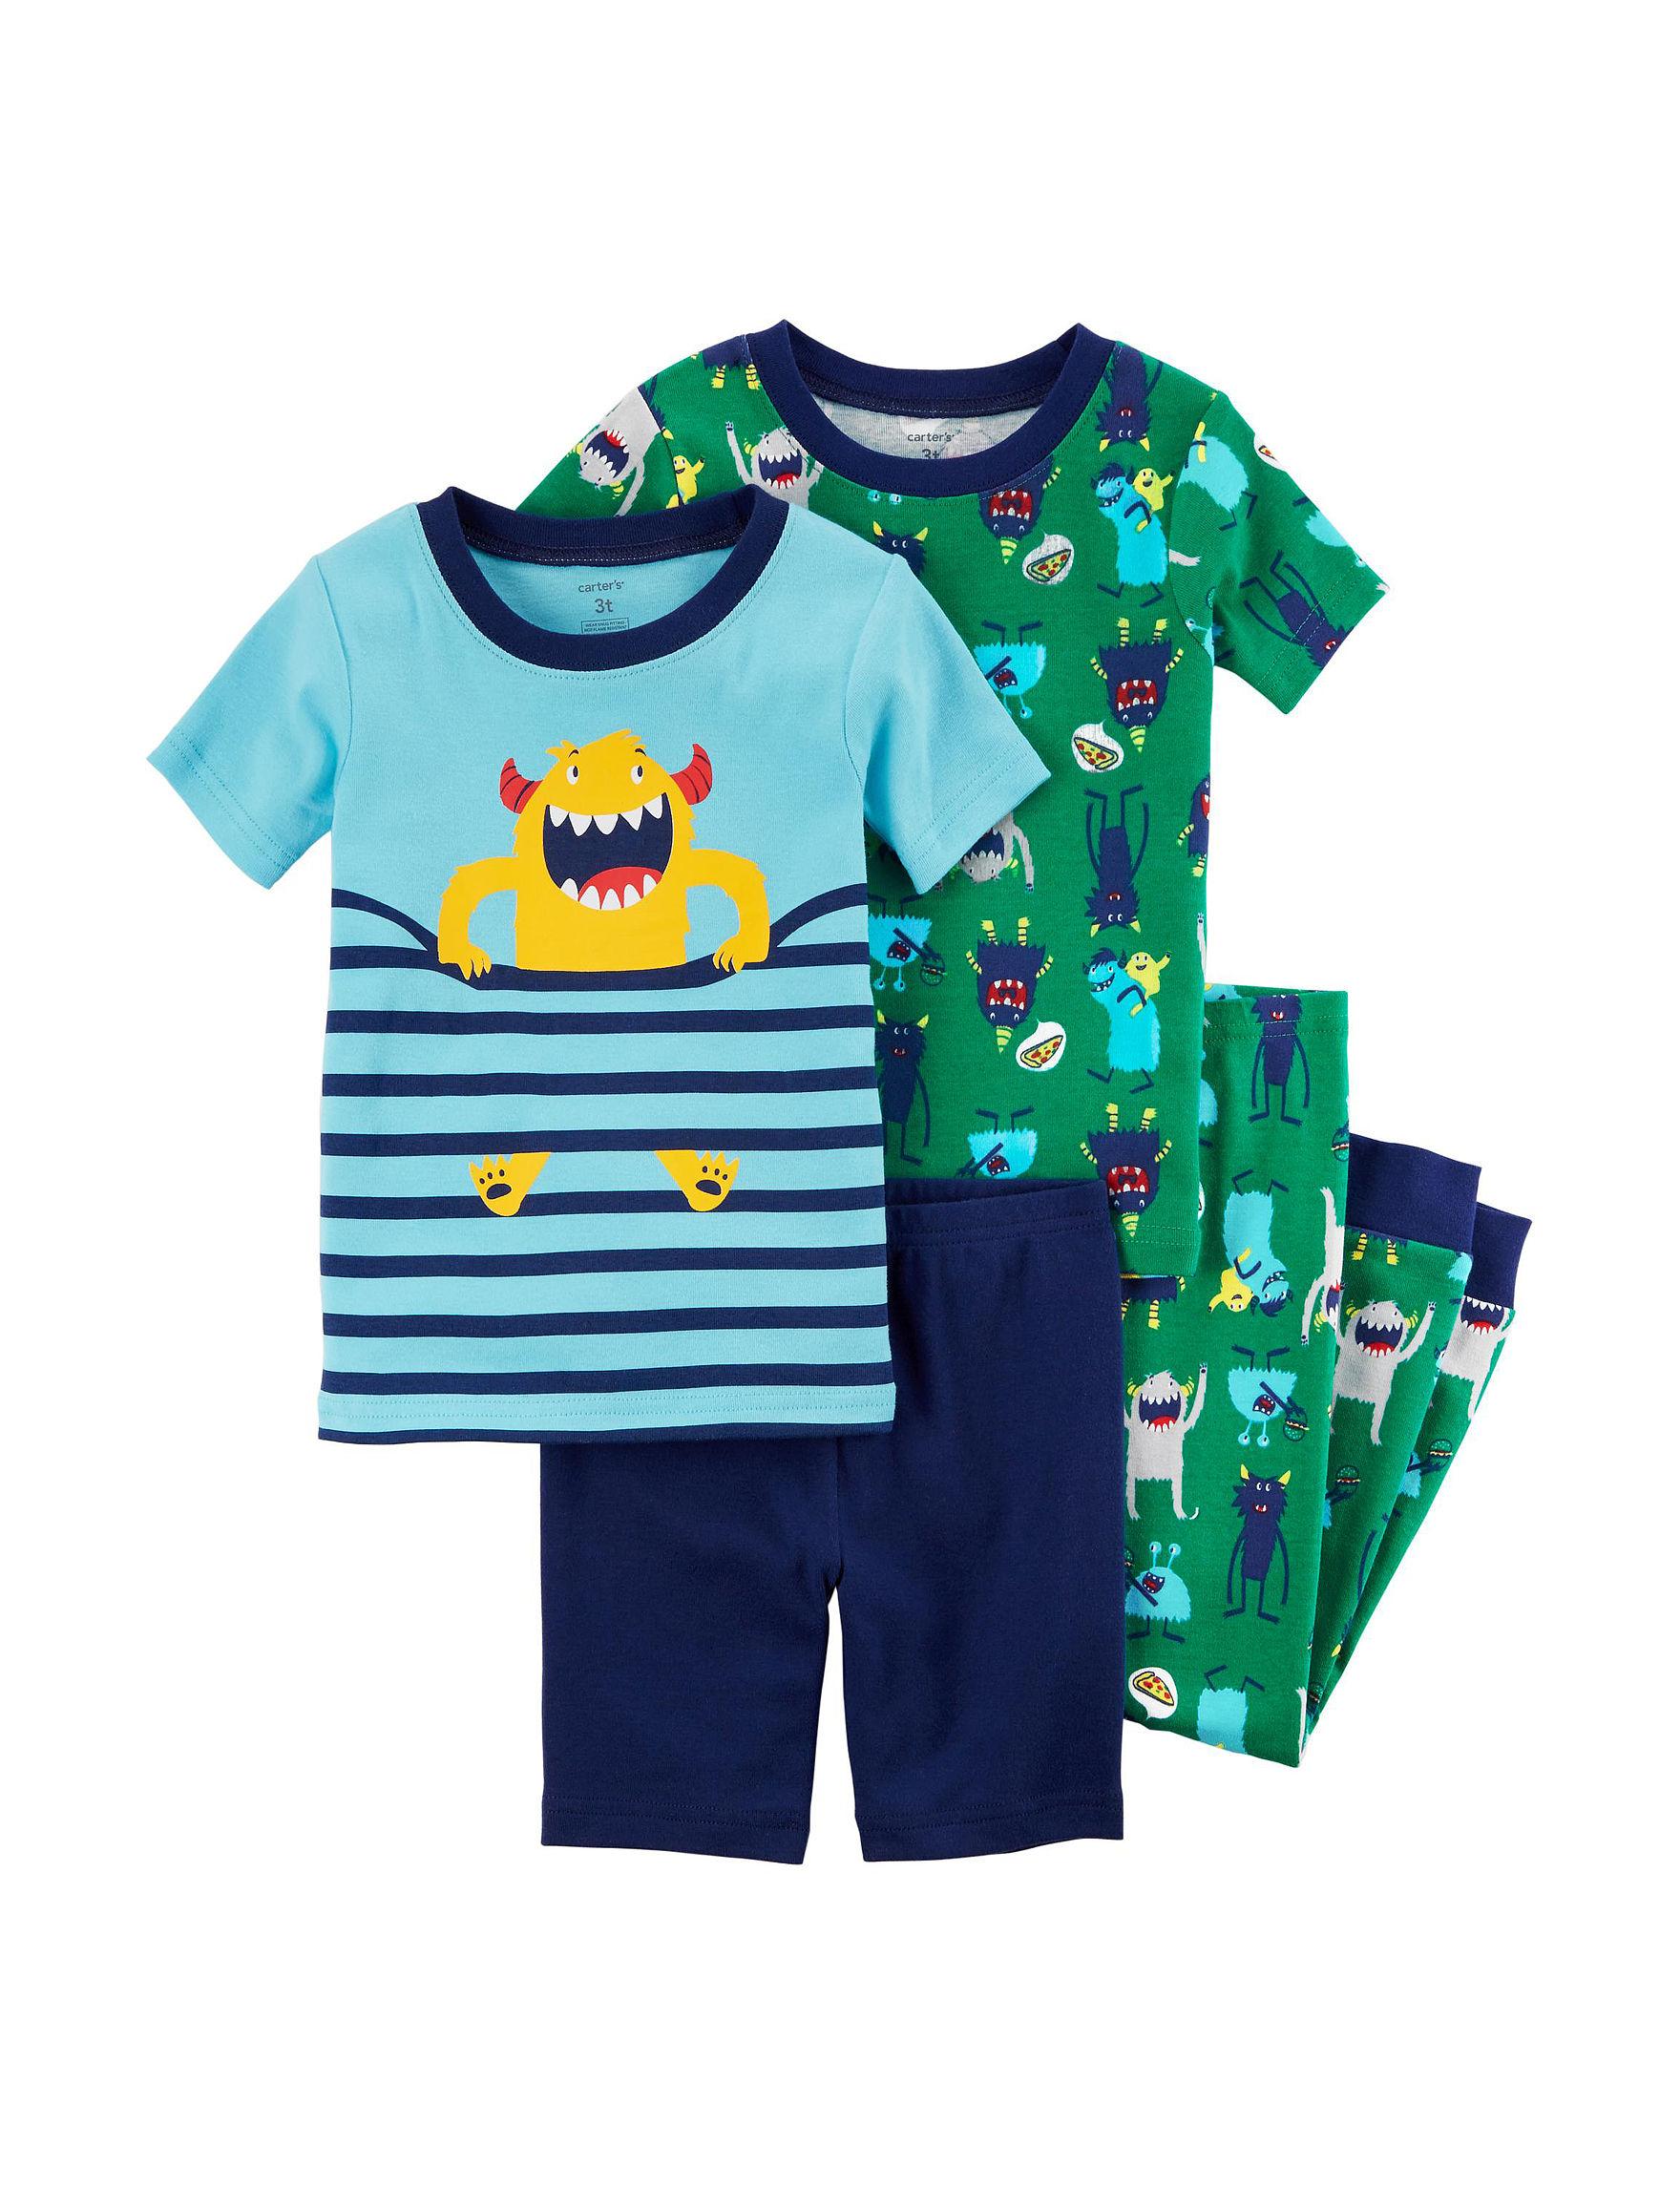 Carter's Blue / Green Pajama Sets